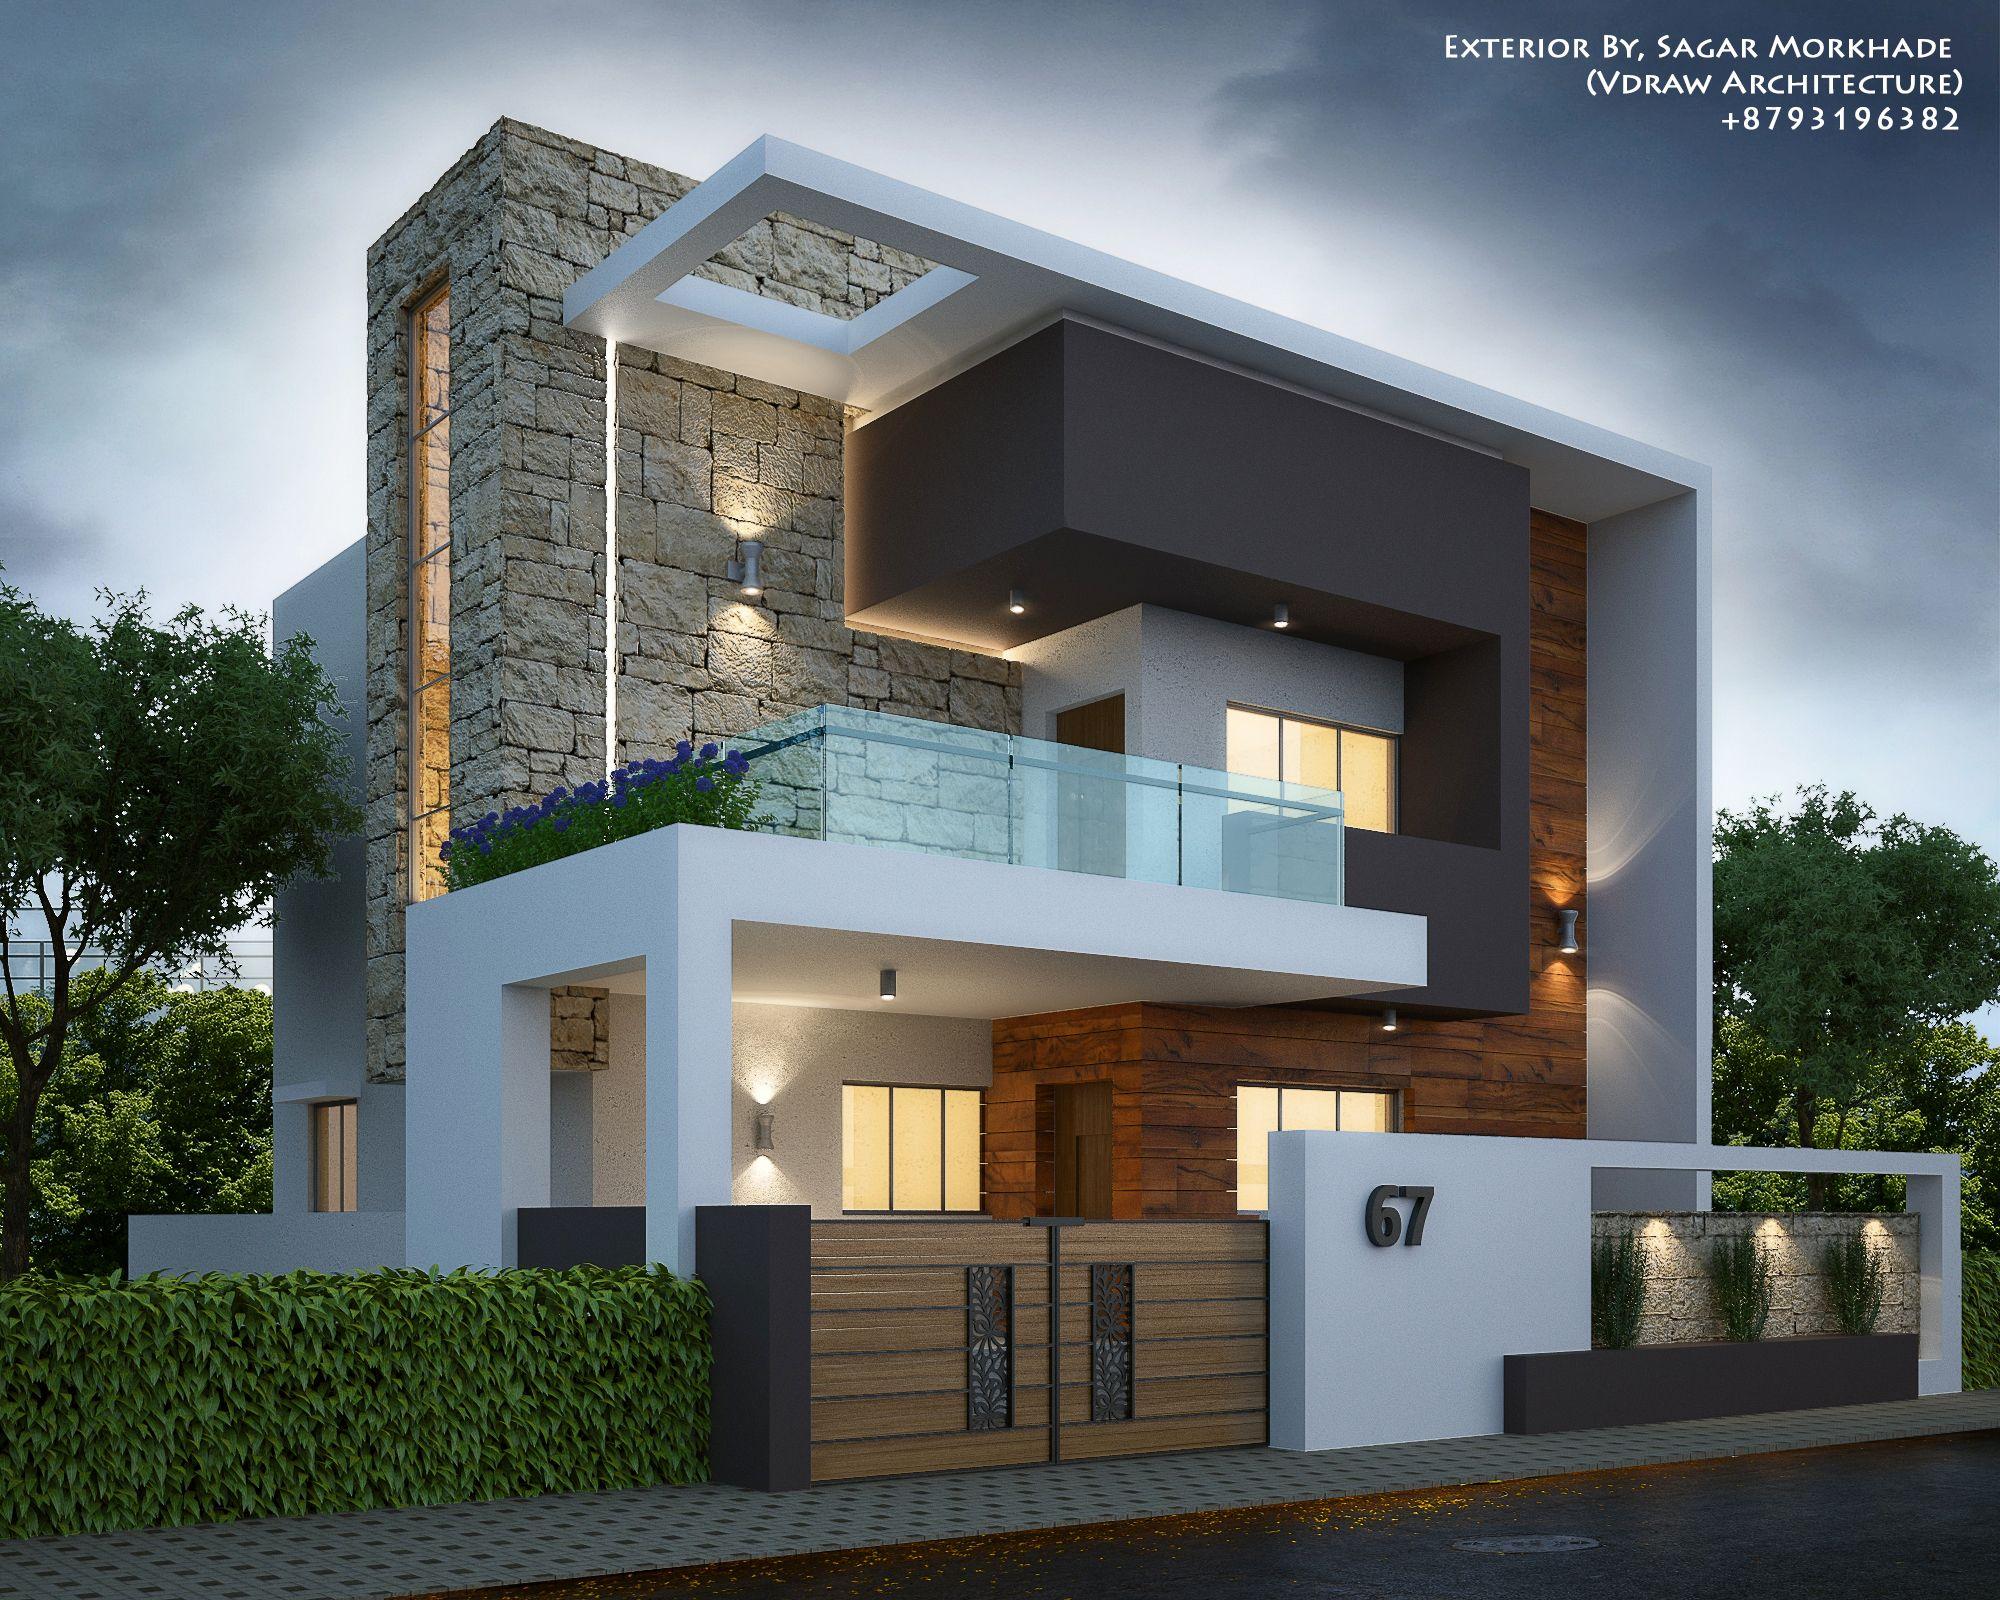 Modern Residential Exterior By Sagar Morkhade Vdraw